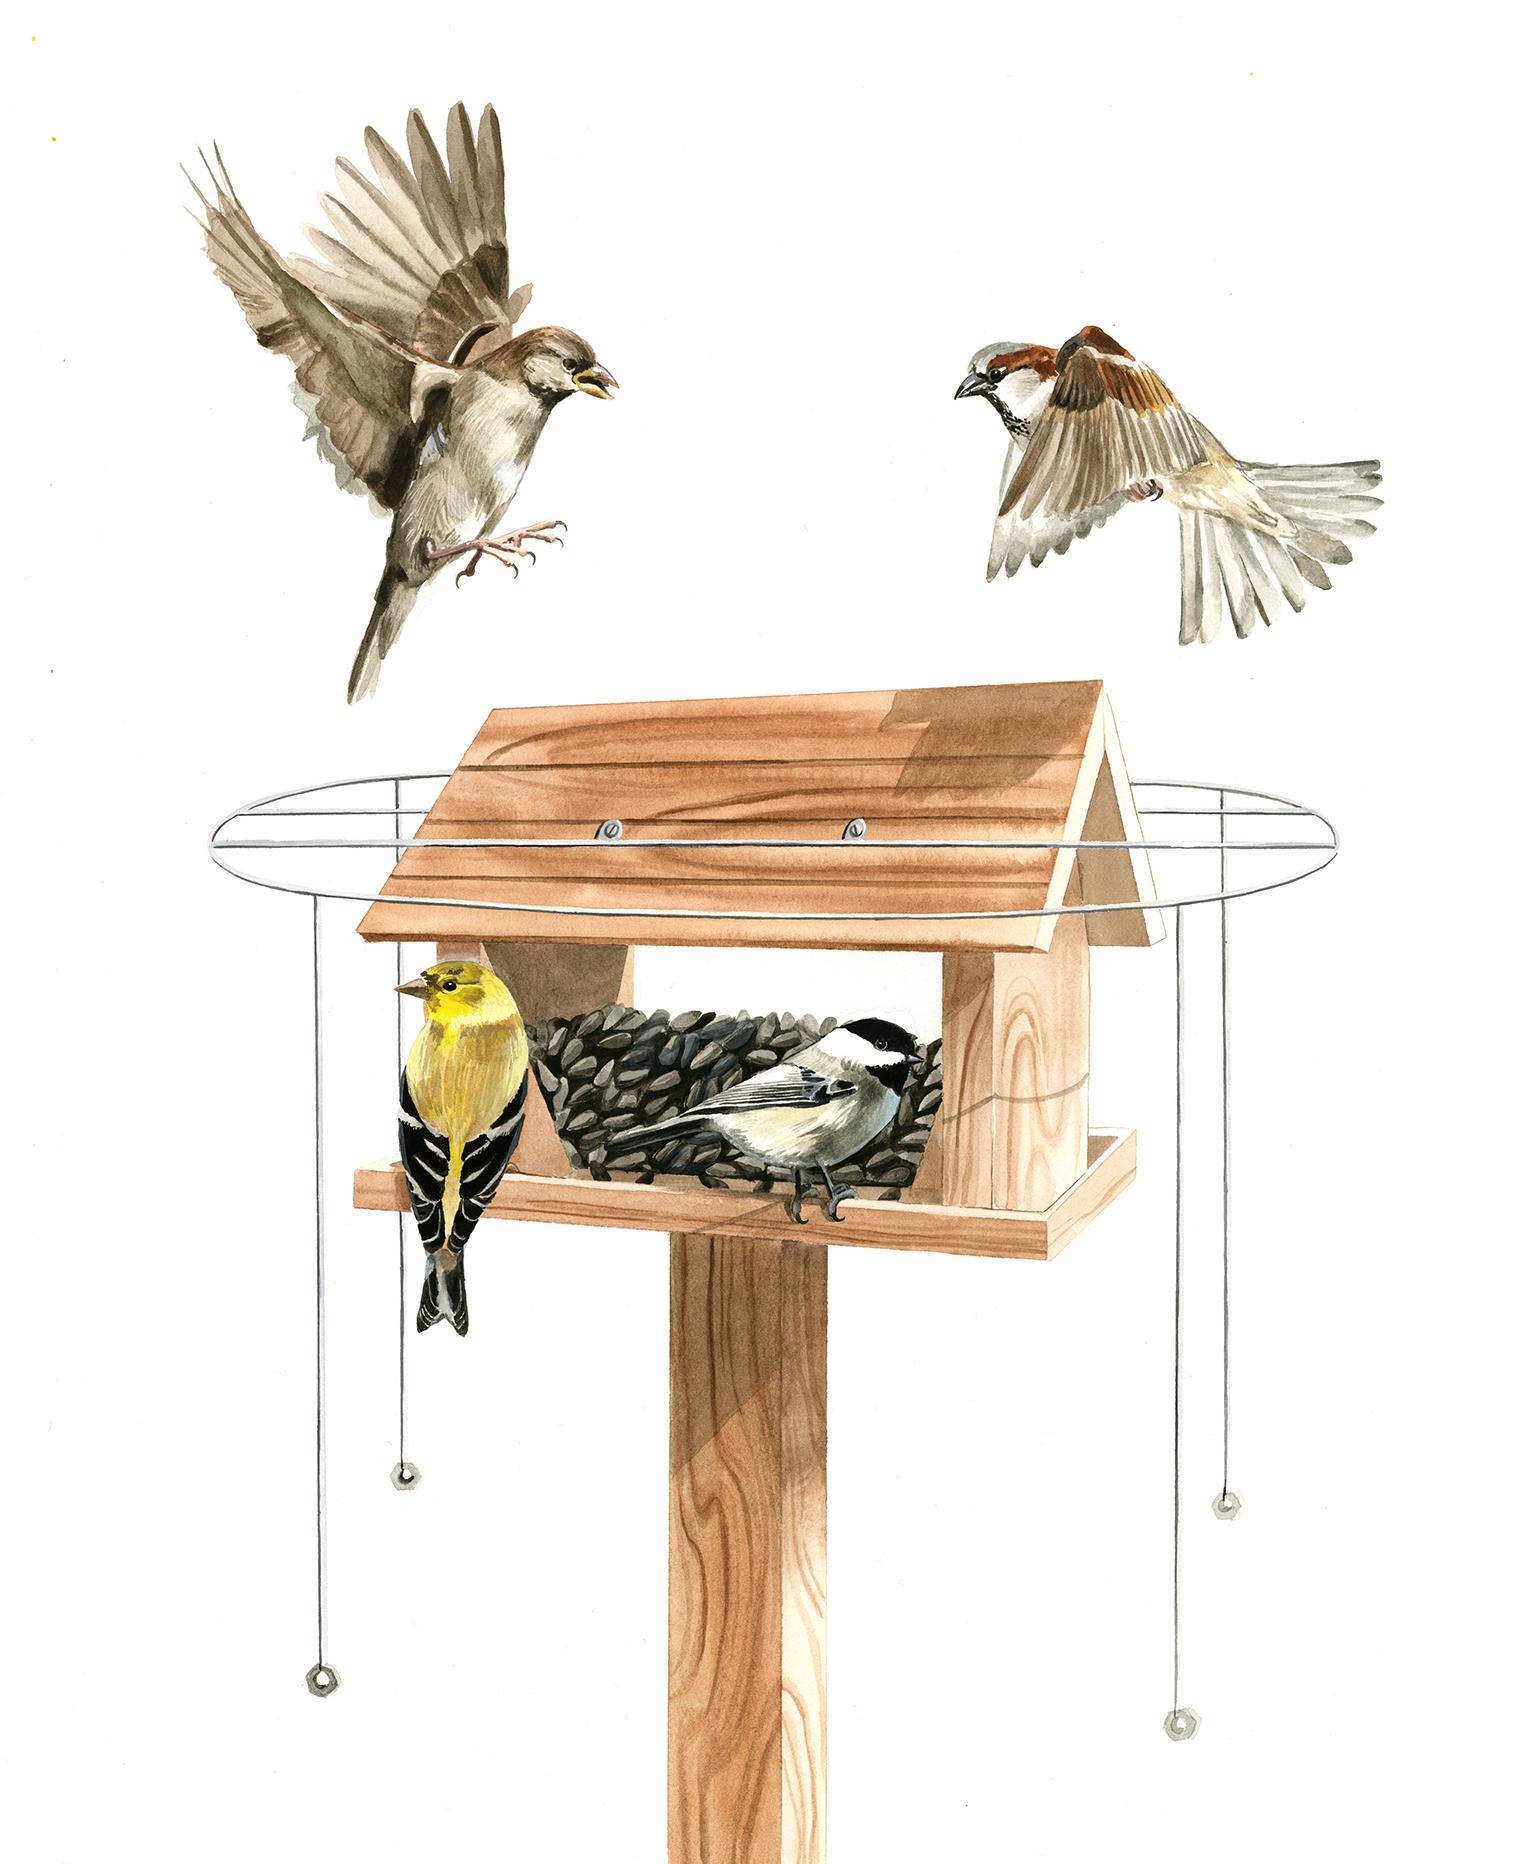 Threaded Wood Dowel, Bird House Plans Cornell, Pallet Table Diy Plans